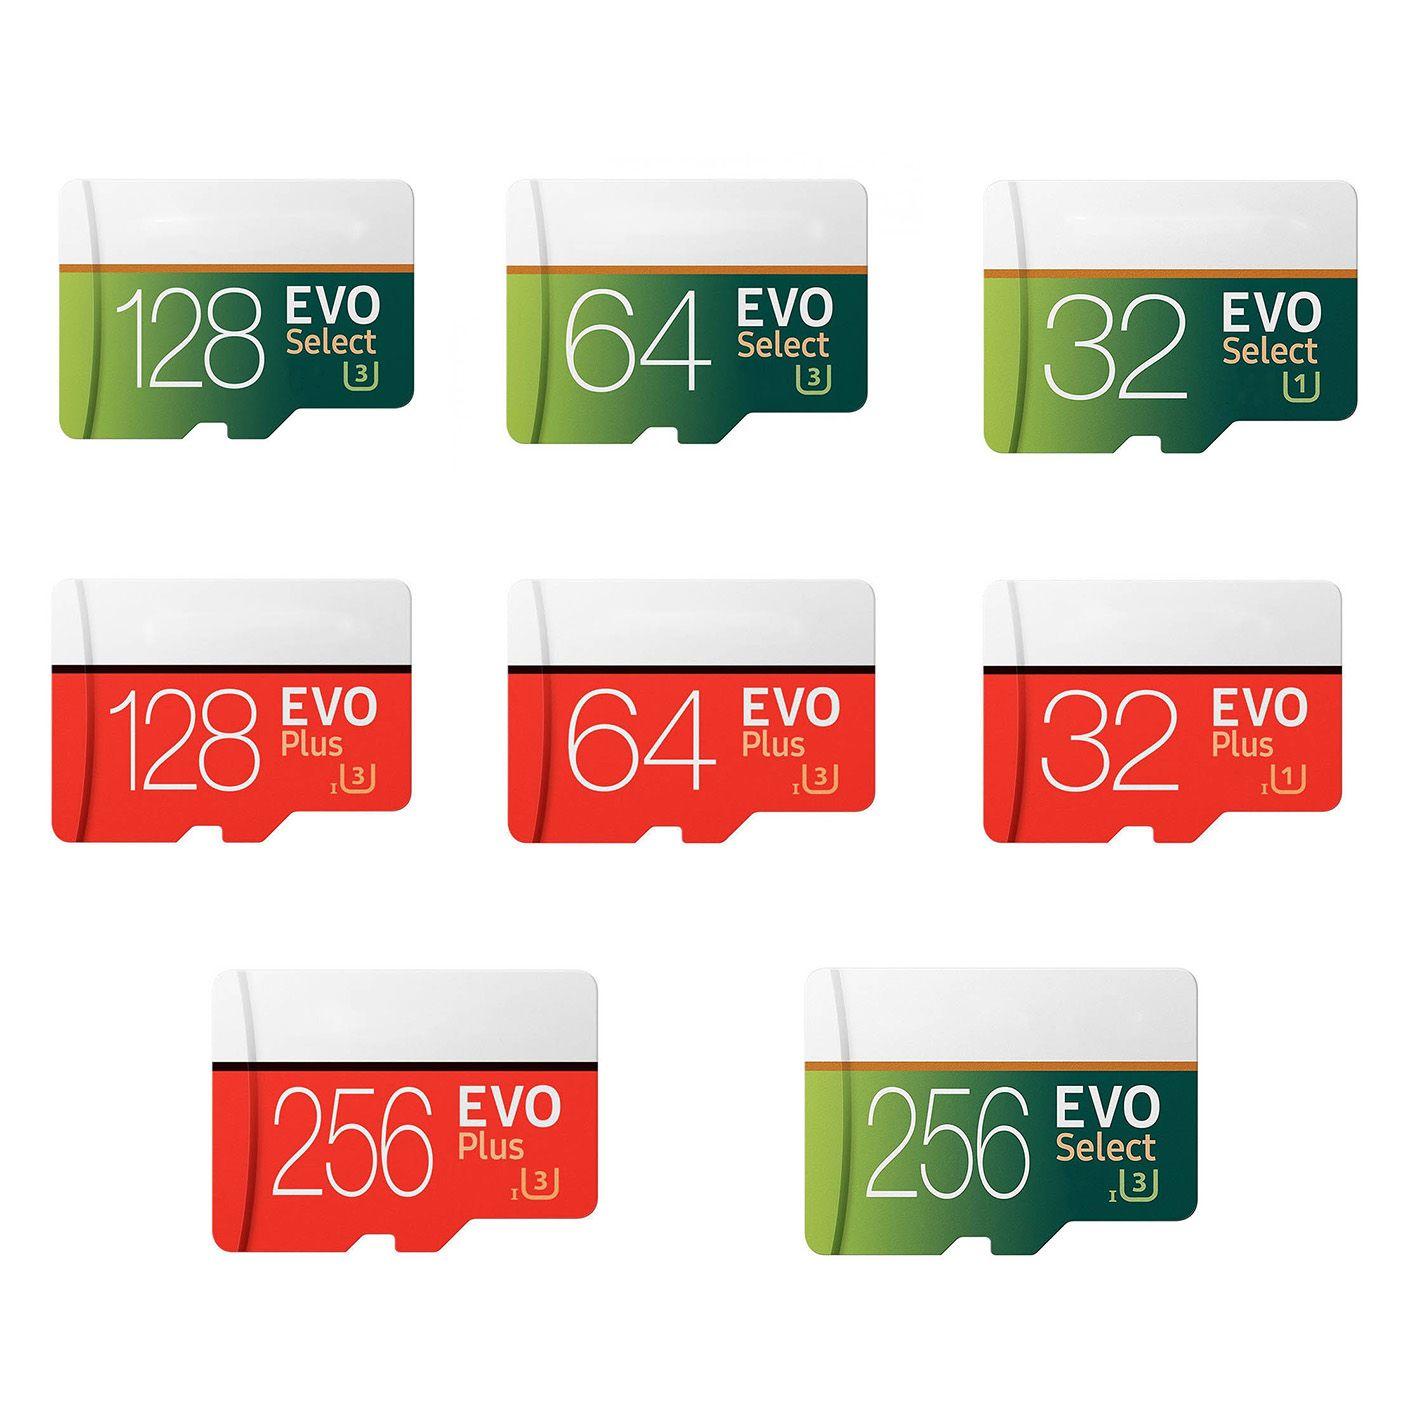 EVO Plus VS EVO Select 256GB 128GB 64GB 32GB SD 마이크로 메모리 TF 트랜스 플래시 카드 고속 카메라 스마트 폰